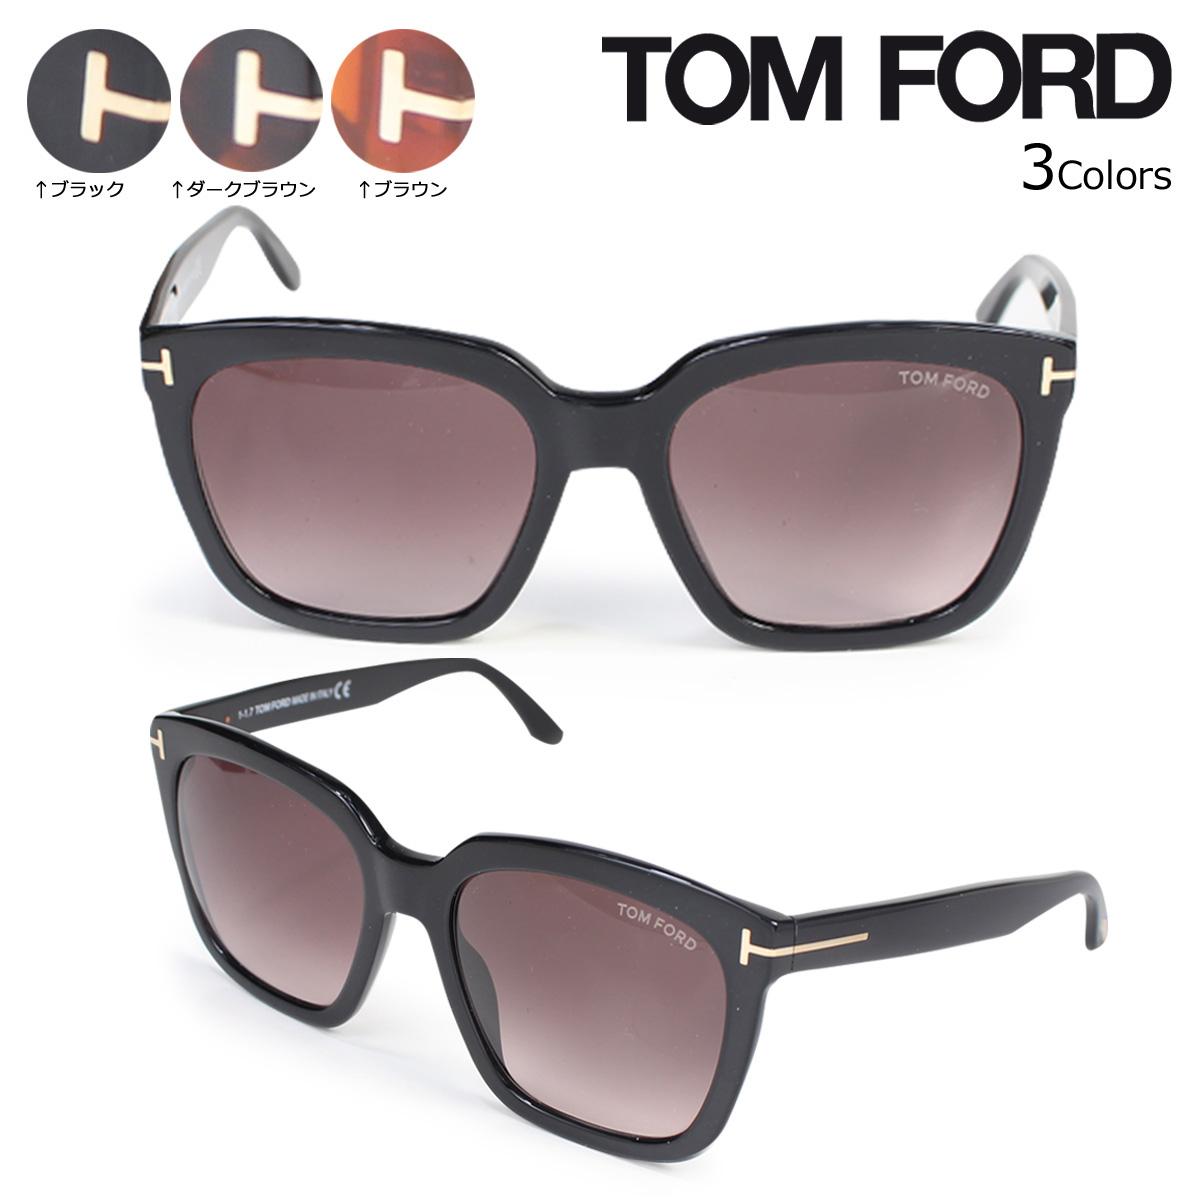 TOM FORD トムフォード サングラス メガネ メンズ レディース アイウェア FT0502 AMARRA SUNGLASSES 3カラー